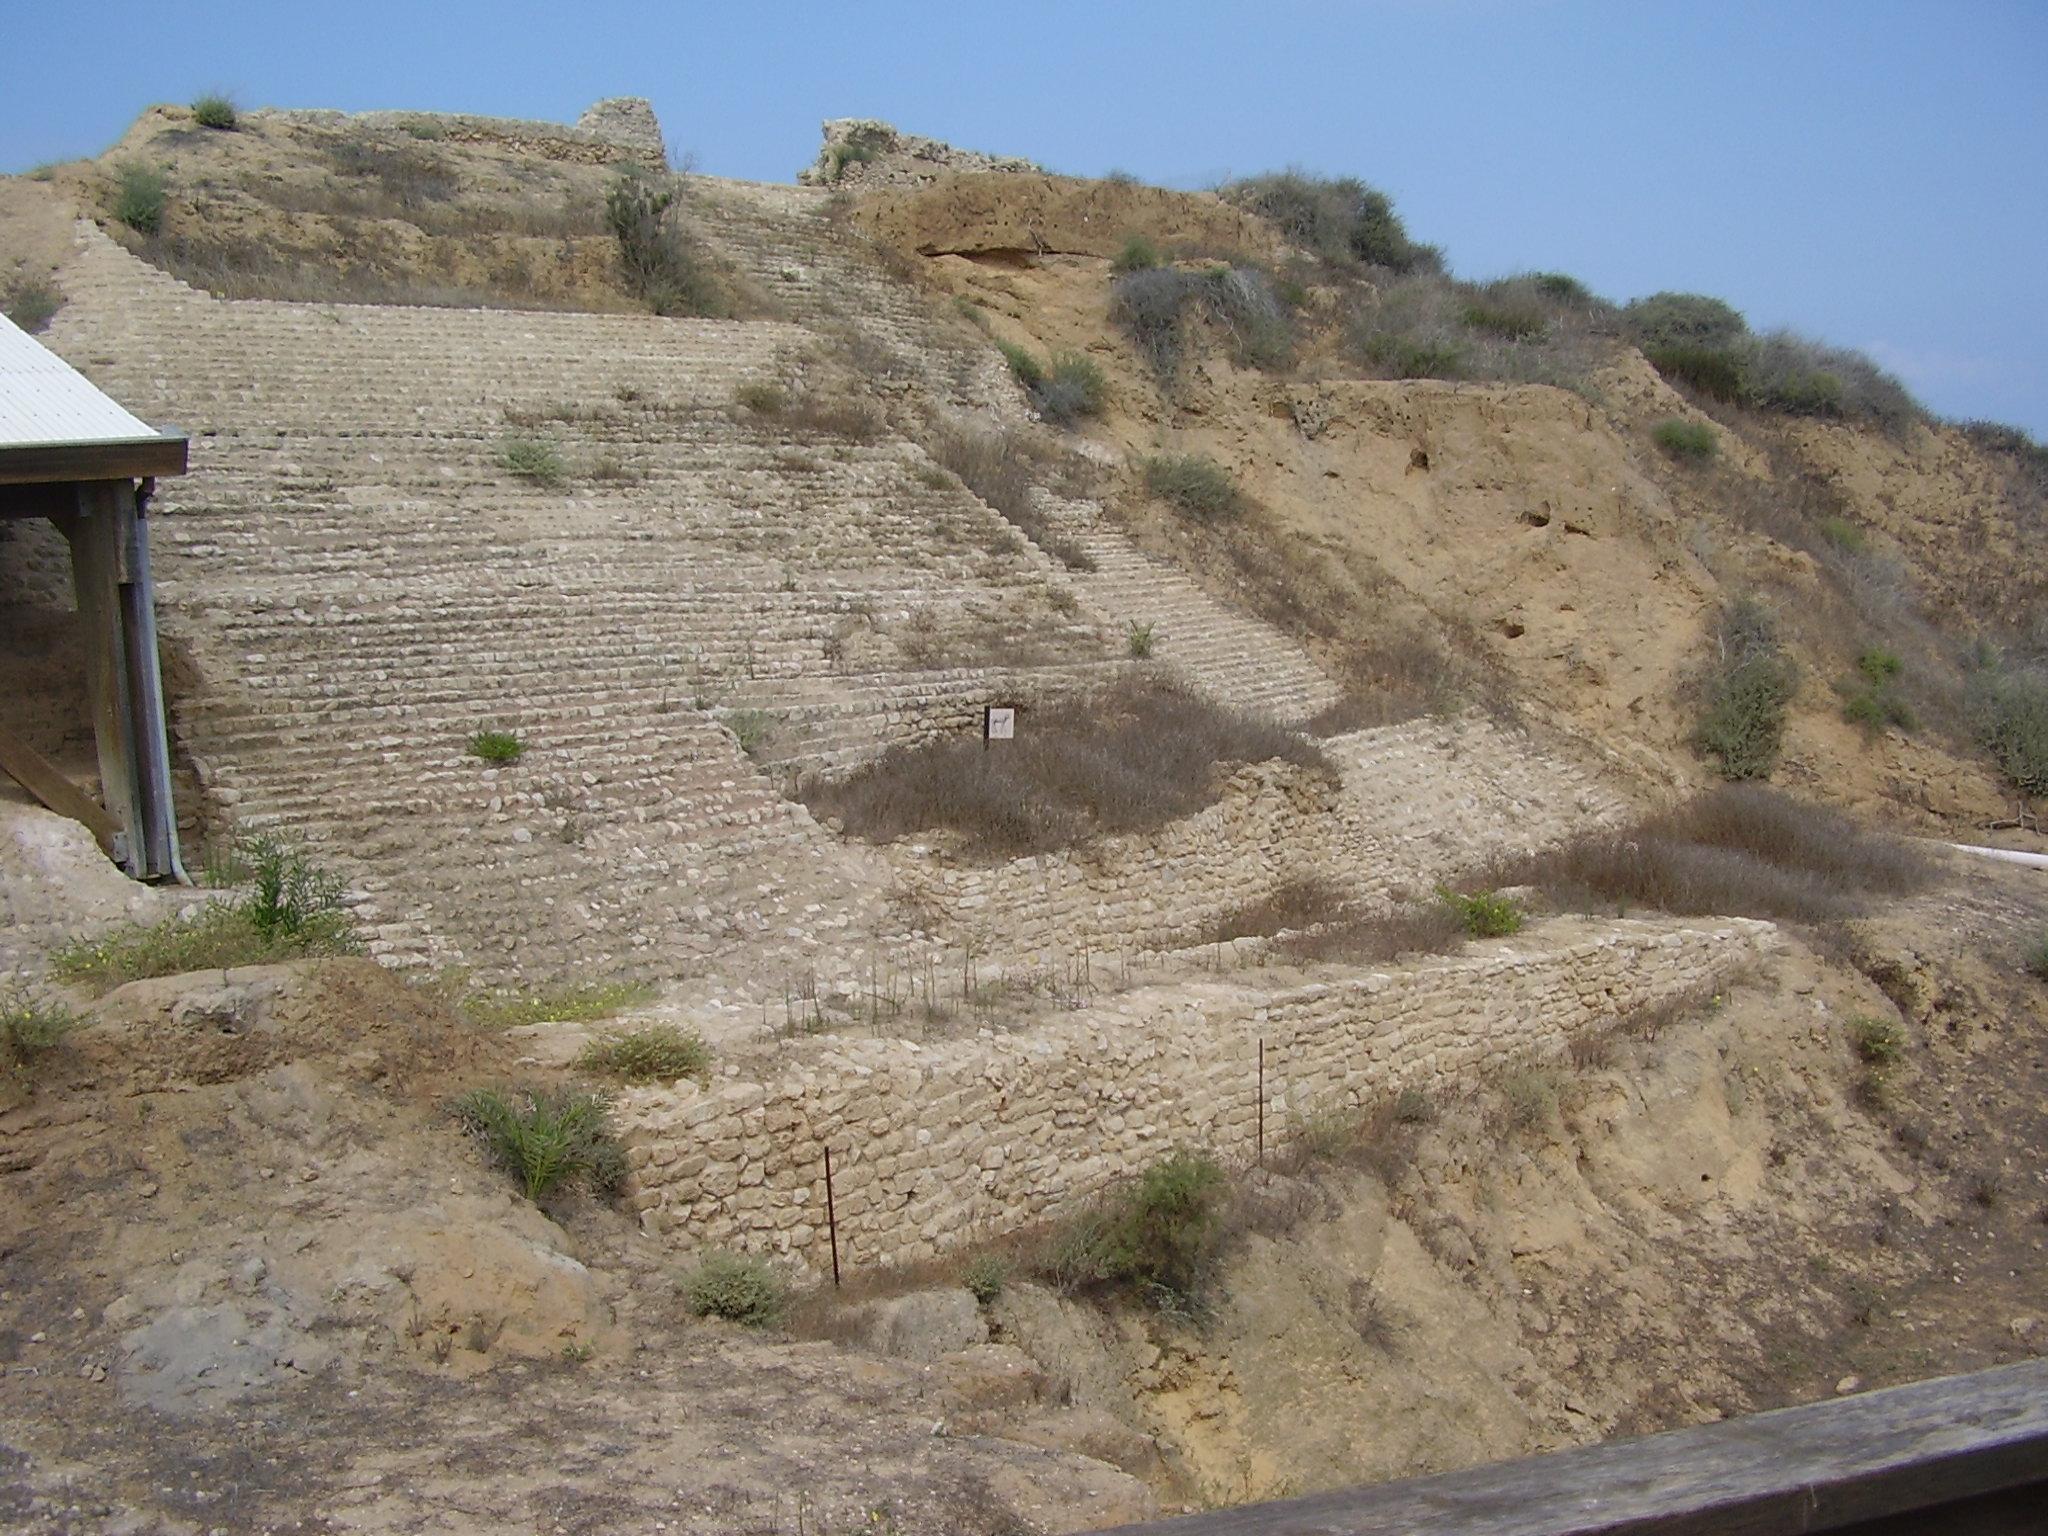 Ashkelon Israel  city photos gallery : PikiWiki Israel 14159 Ashkelon National Park Wikimedia ...